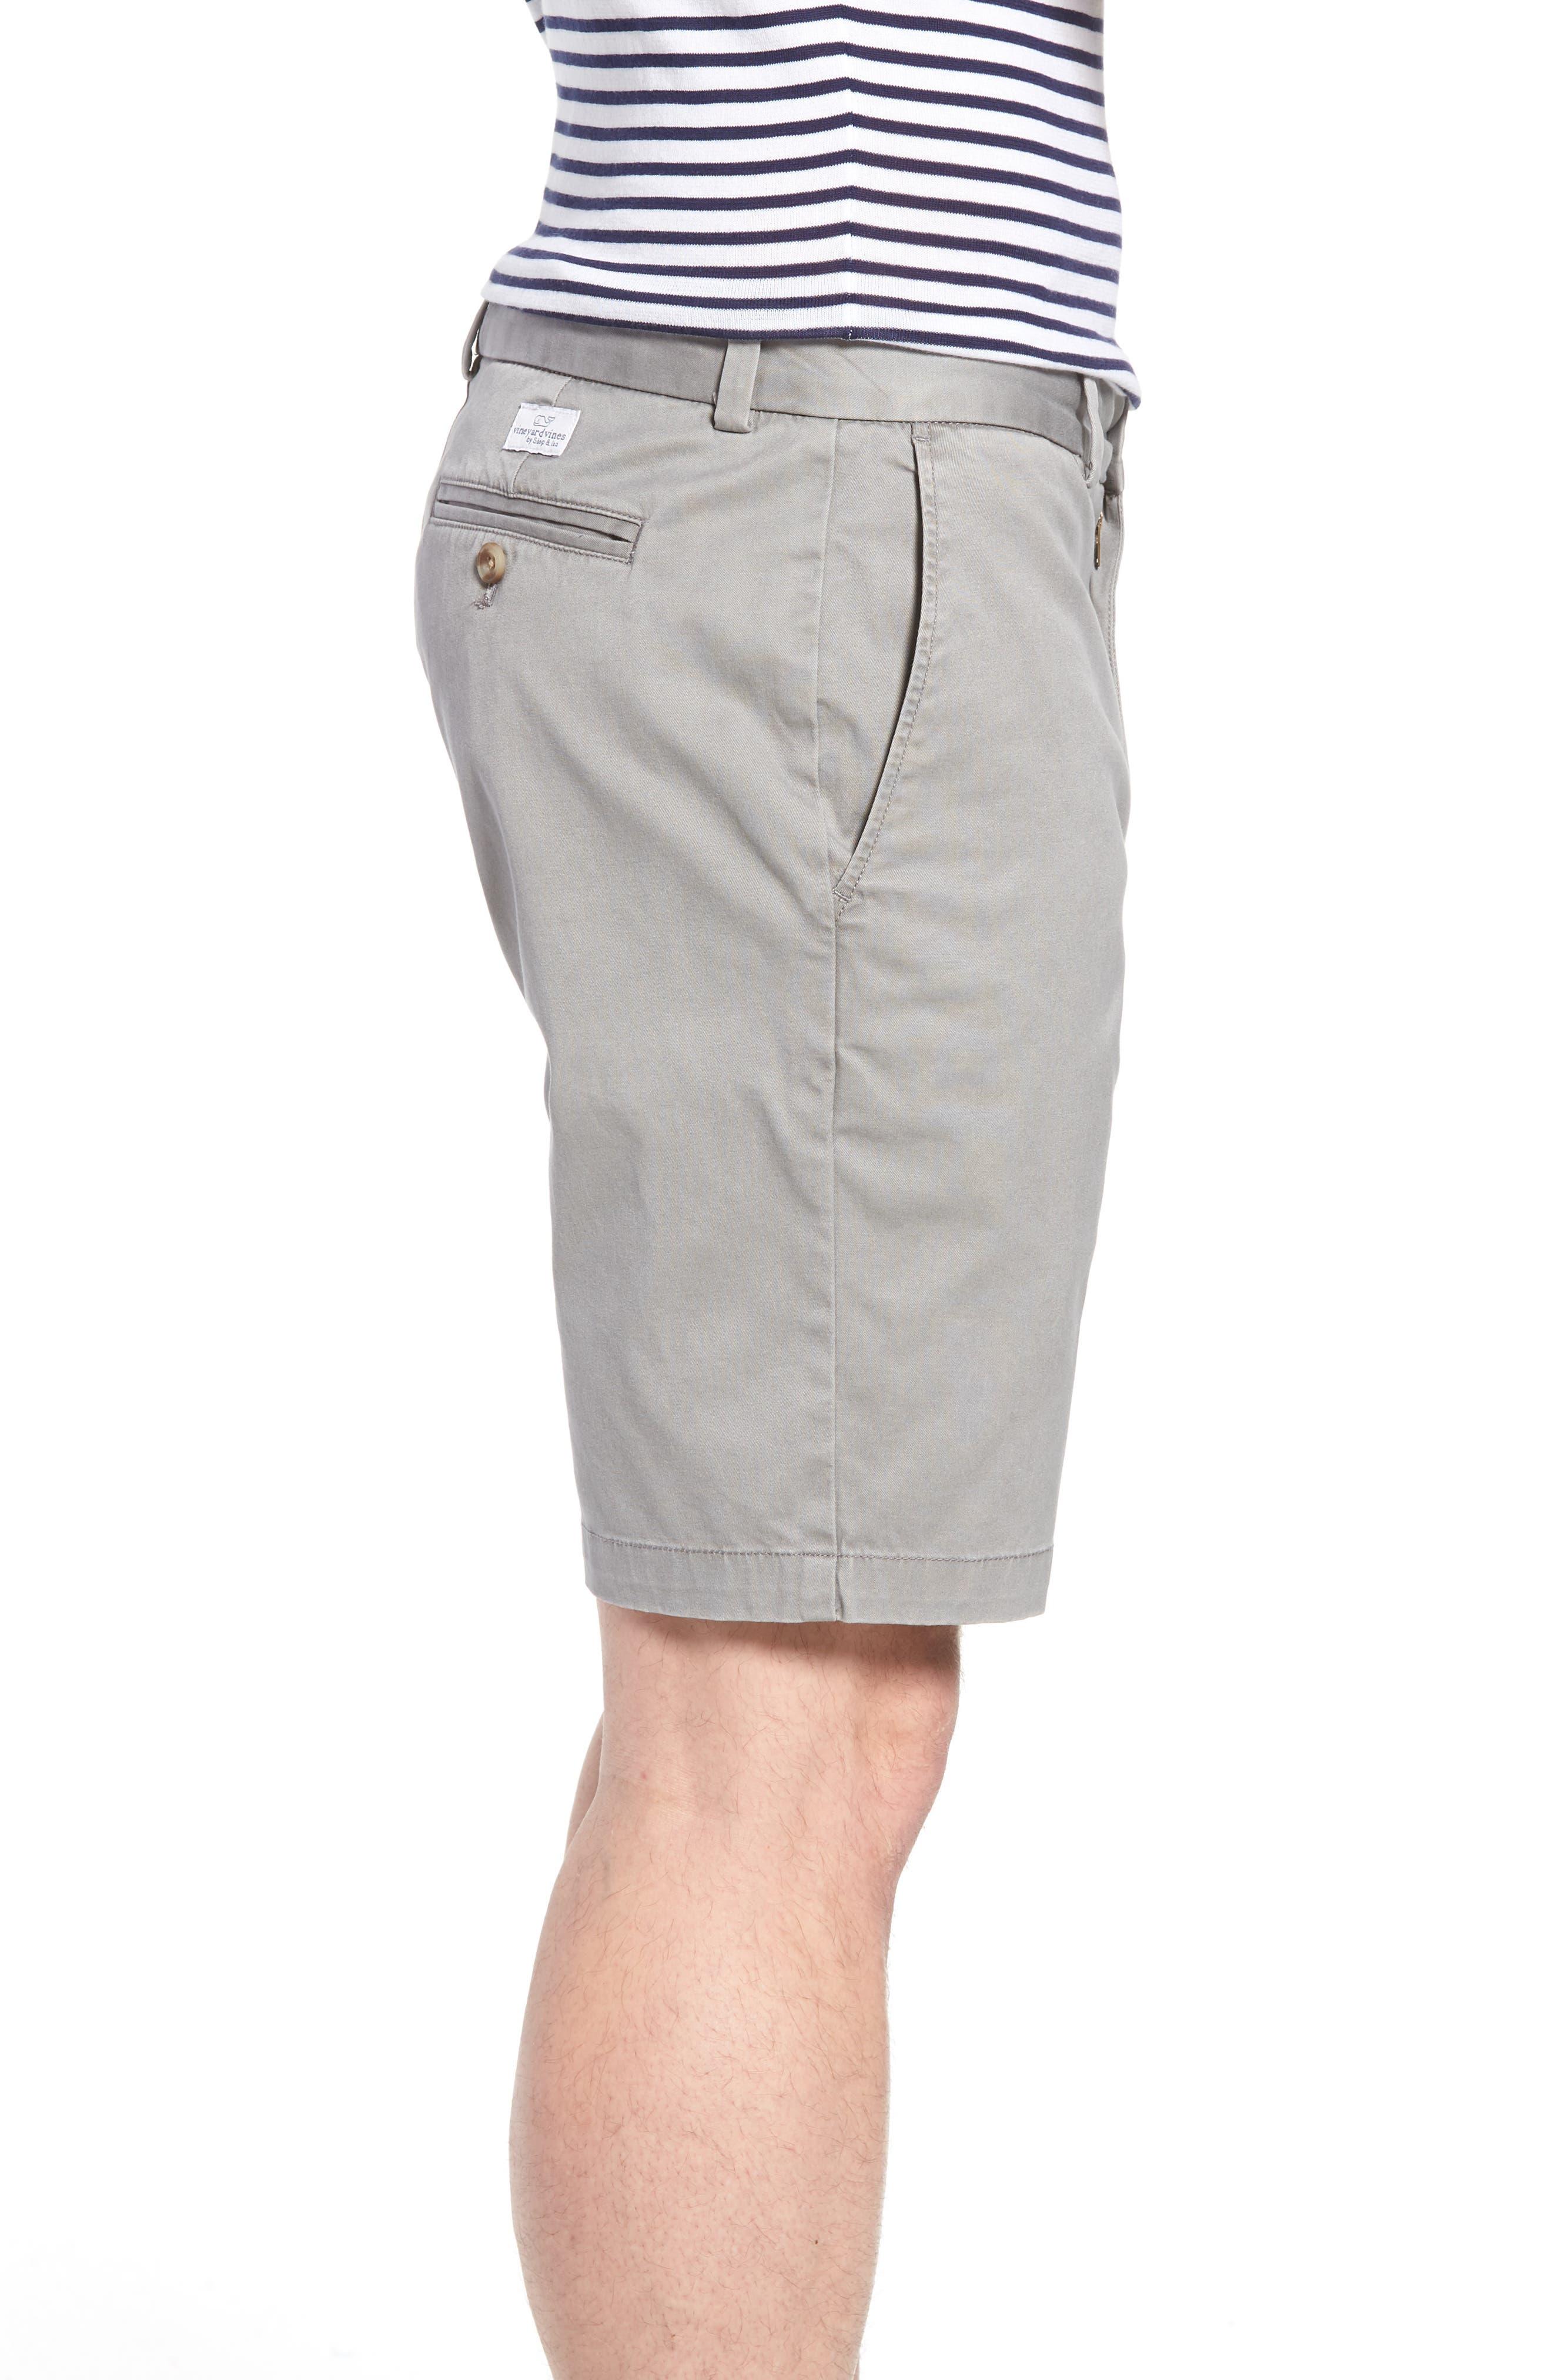 9 Inch Stretch Breaker Shorts,                             Alternate thumbnail 46, color,